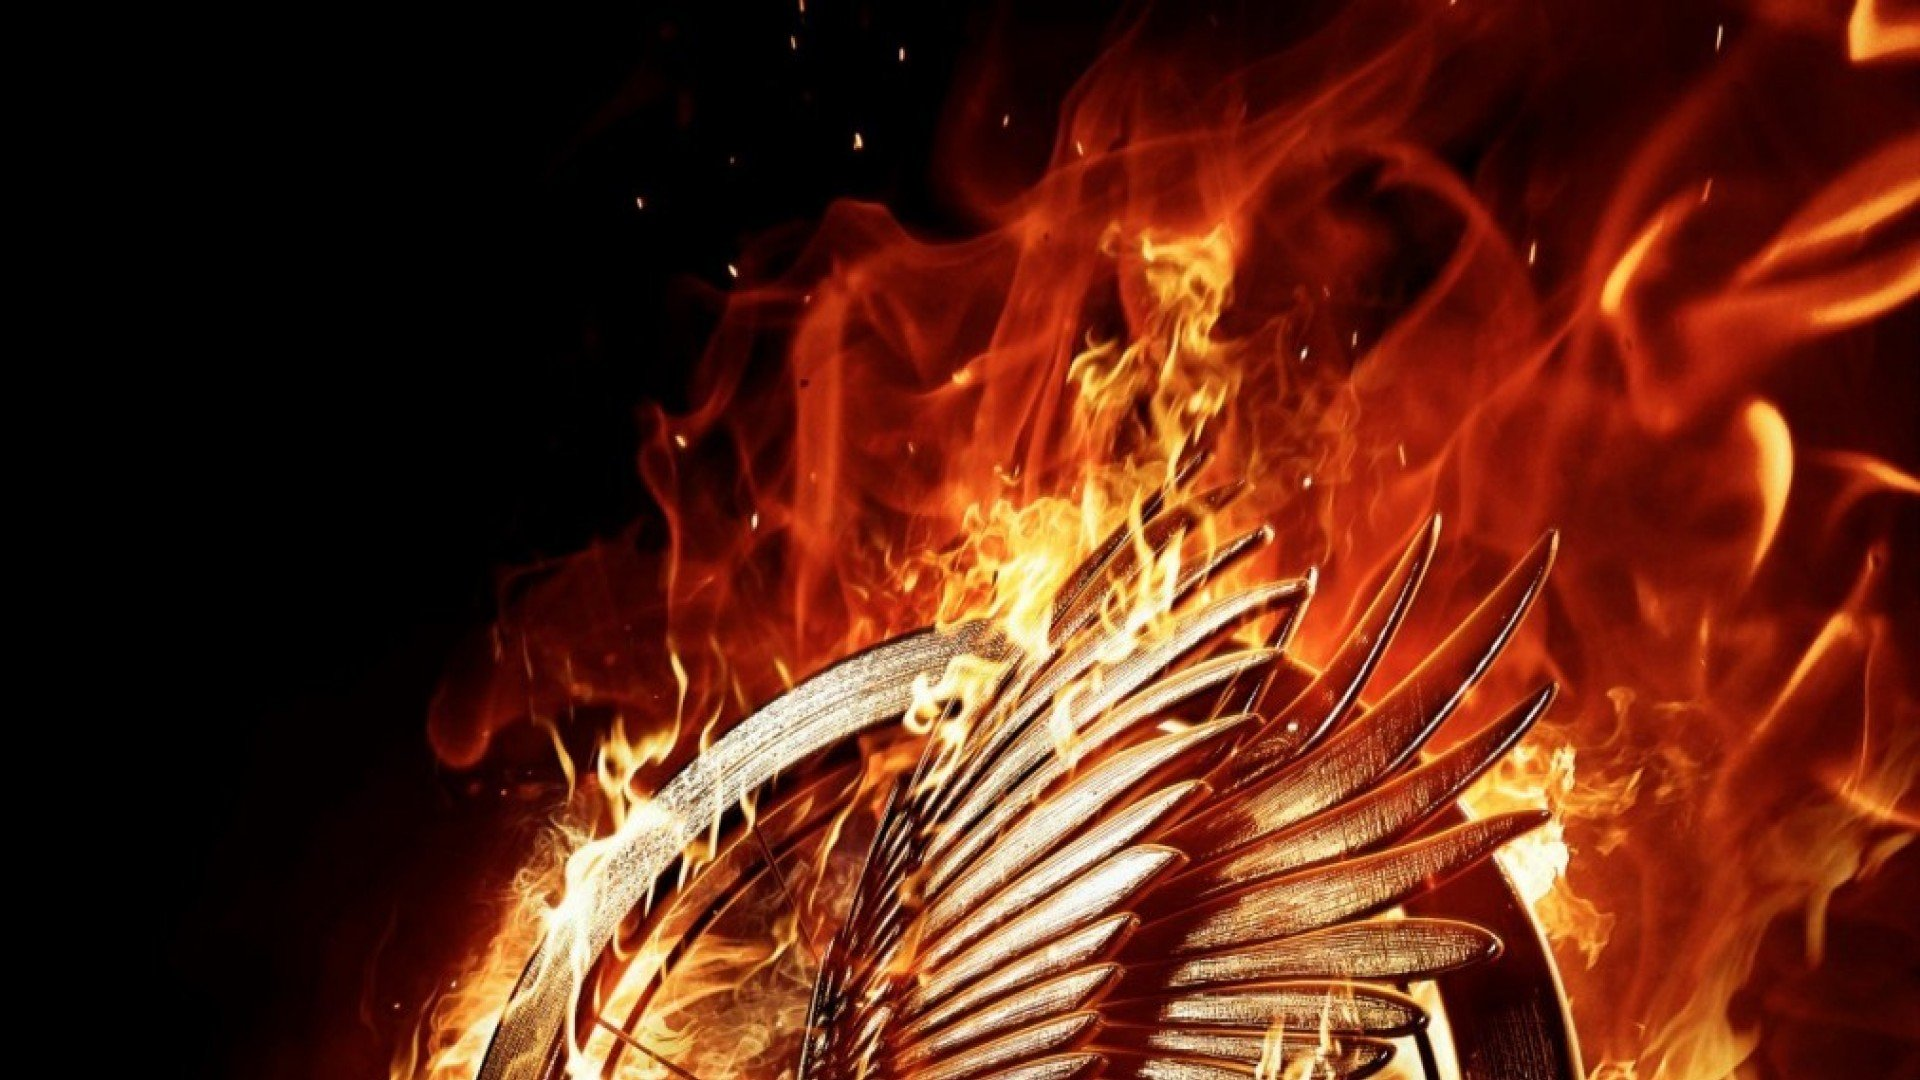 Hunger Games Mockingjay Part 1 Wallpaper